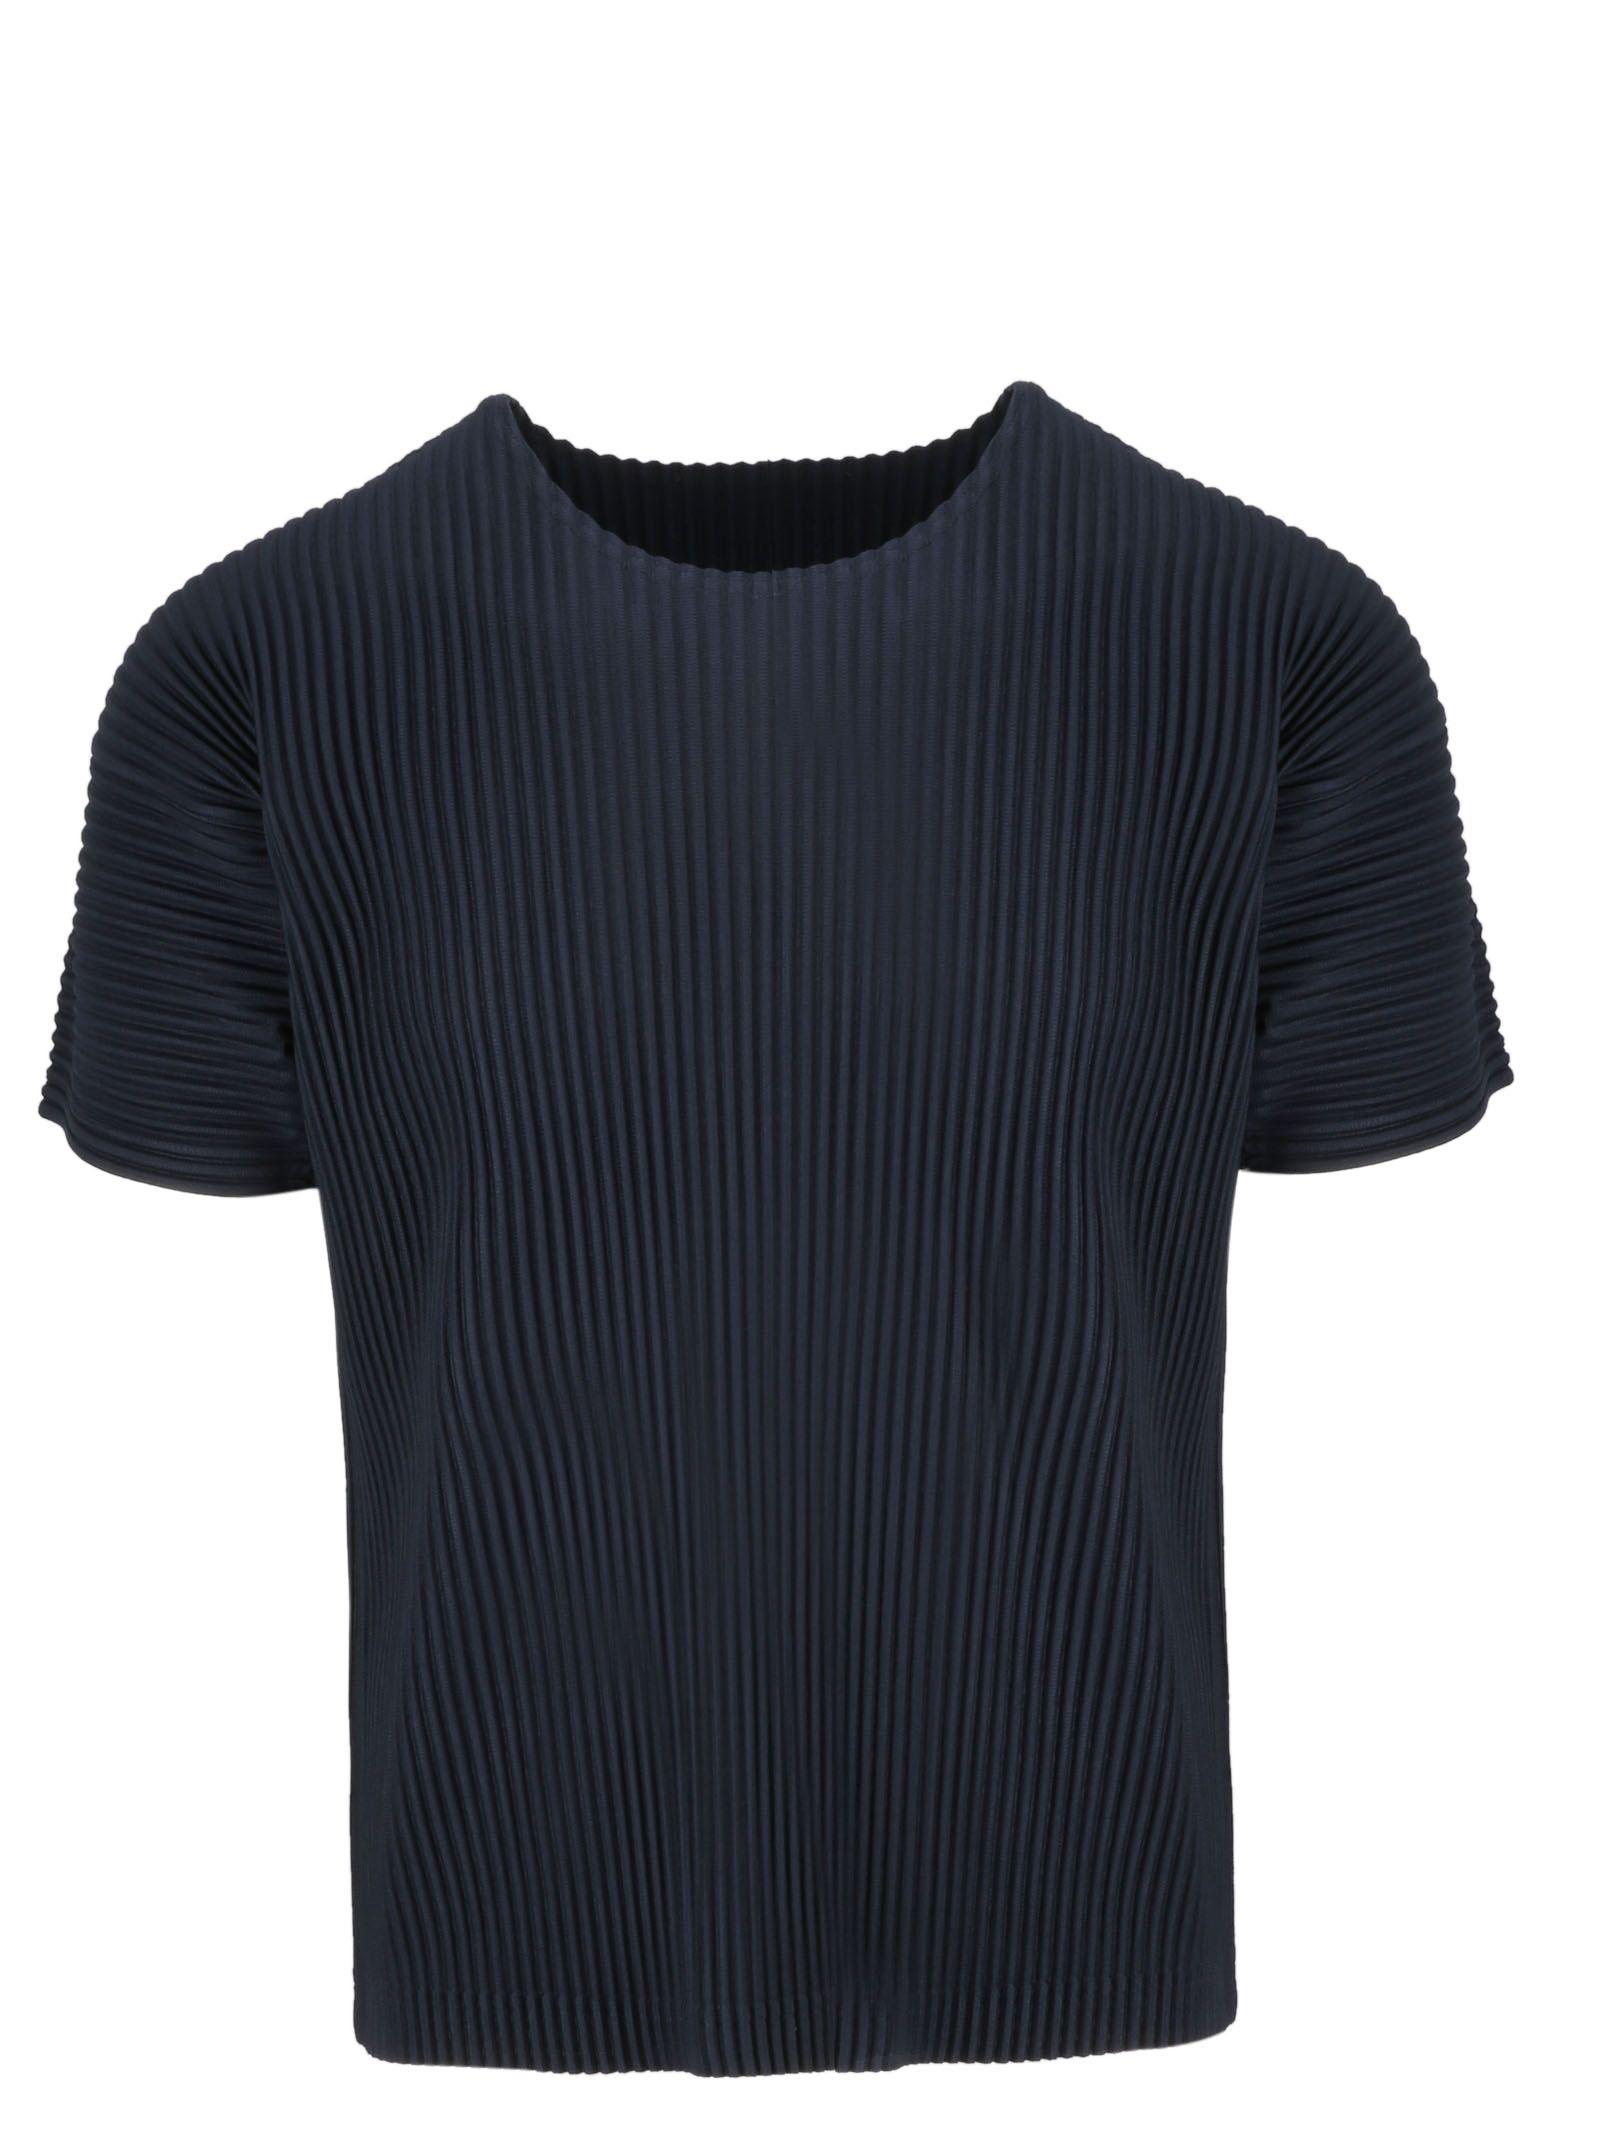 Homme Plisse` Issey Miyake Corduroy T-shirt